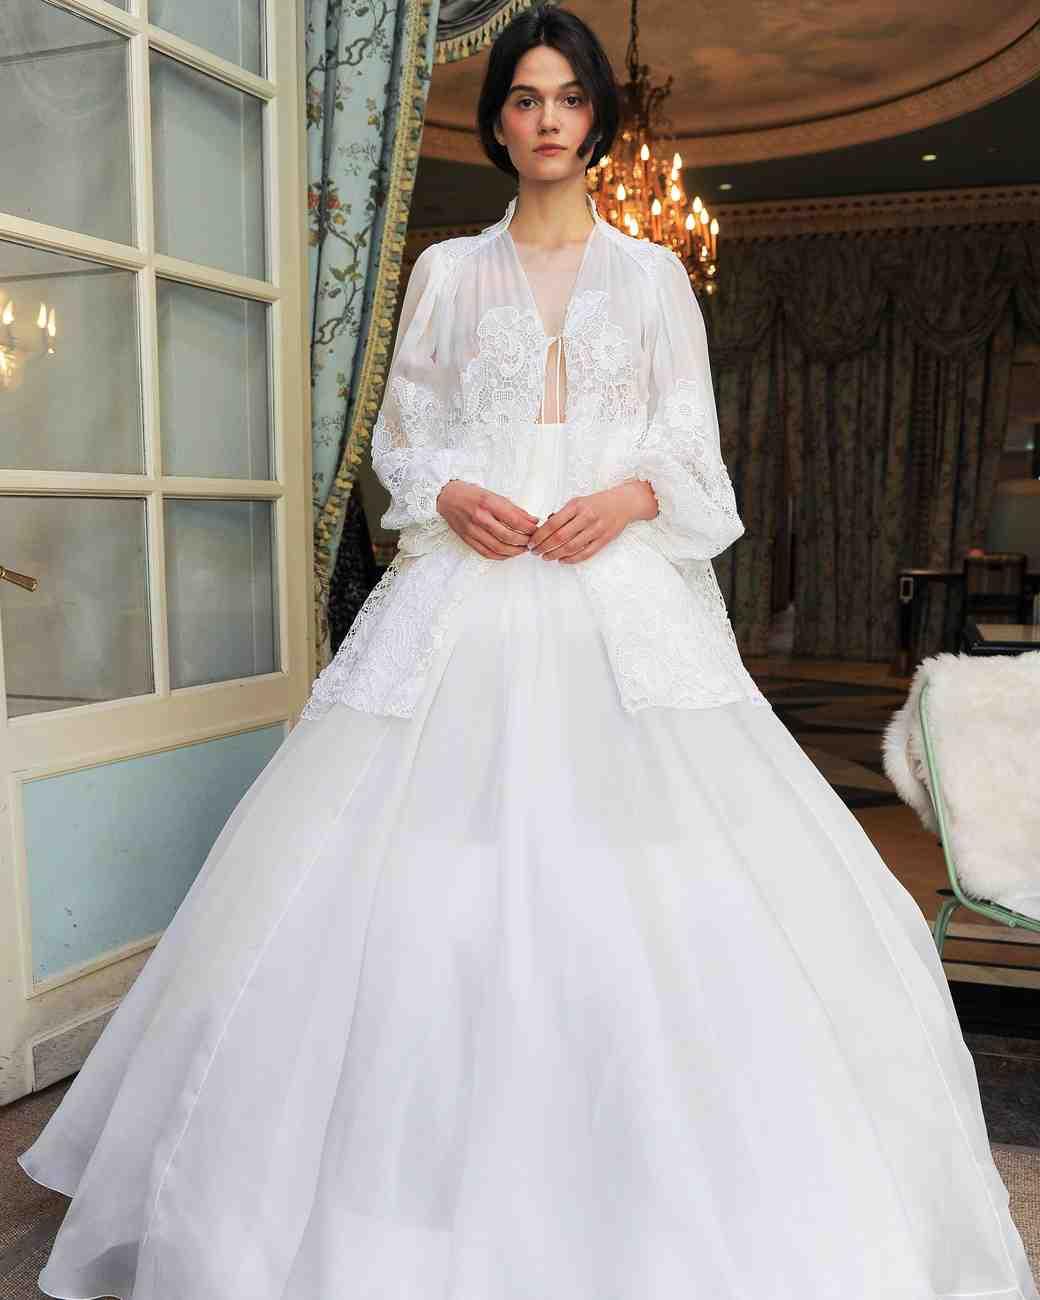 j mendel wedding dresses spring j mendel wedding dress J Mendel